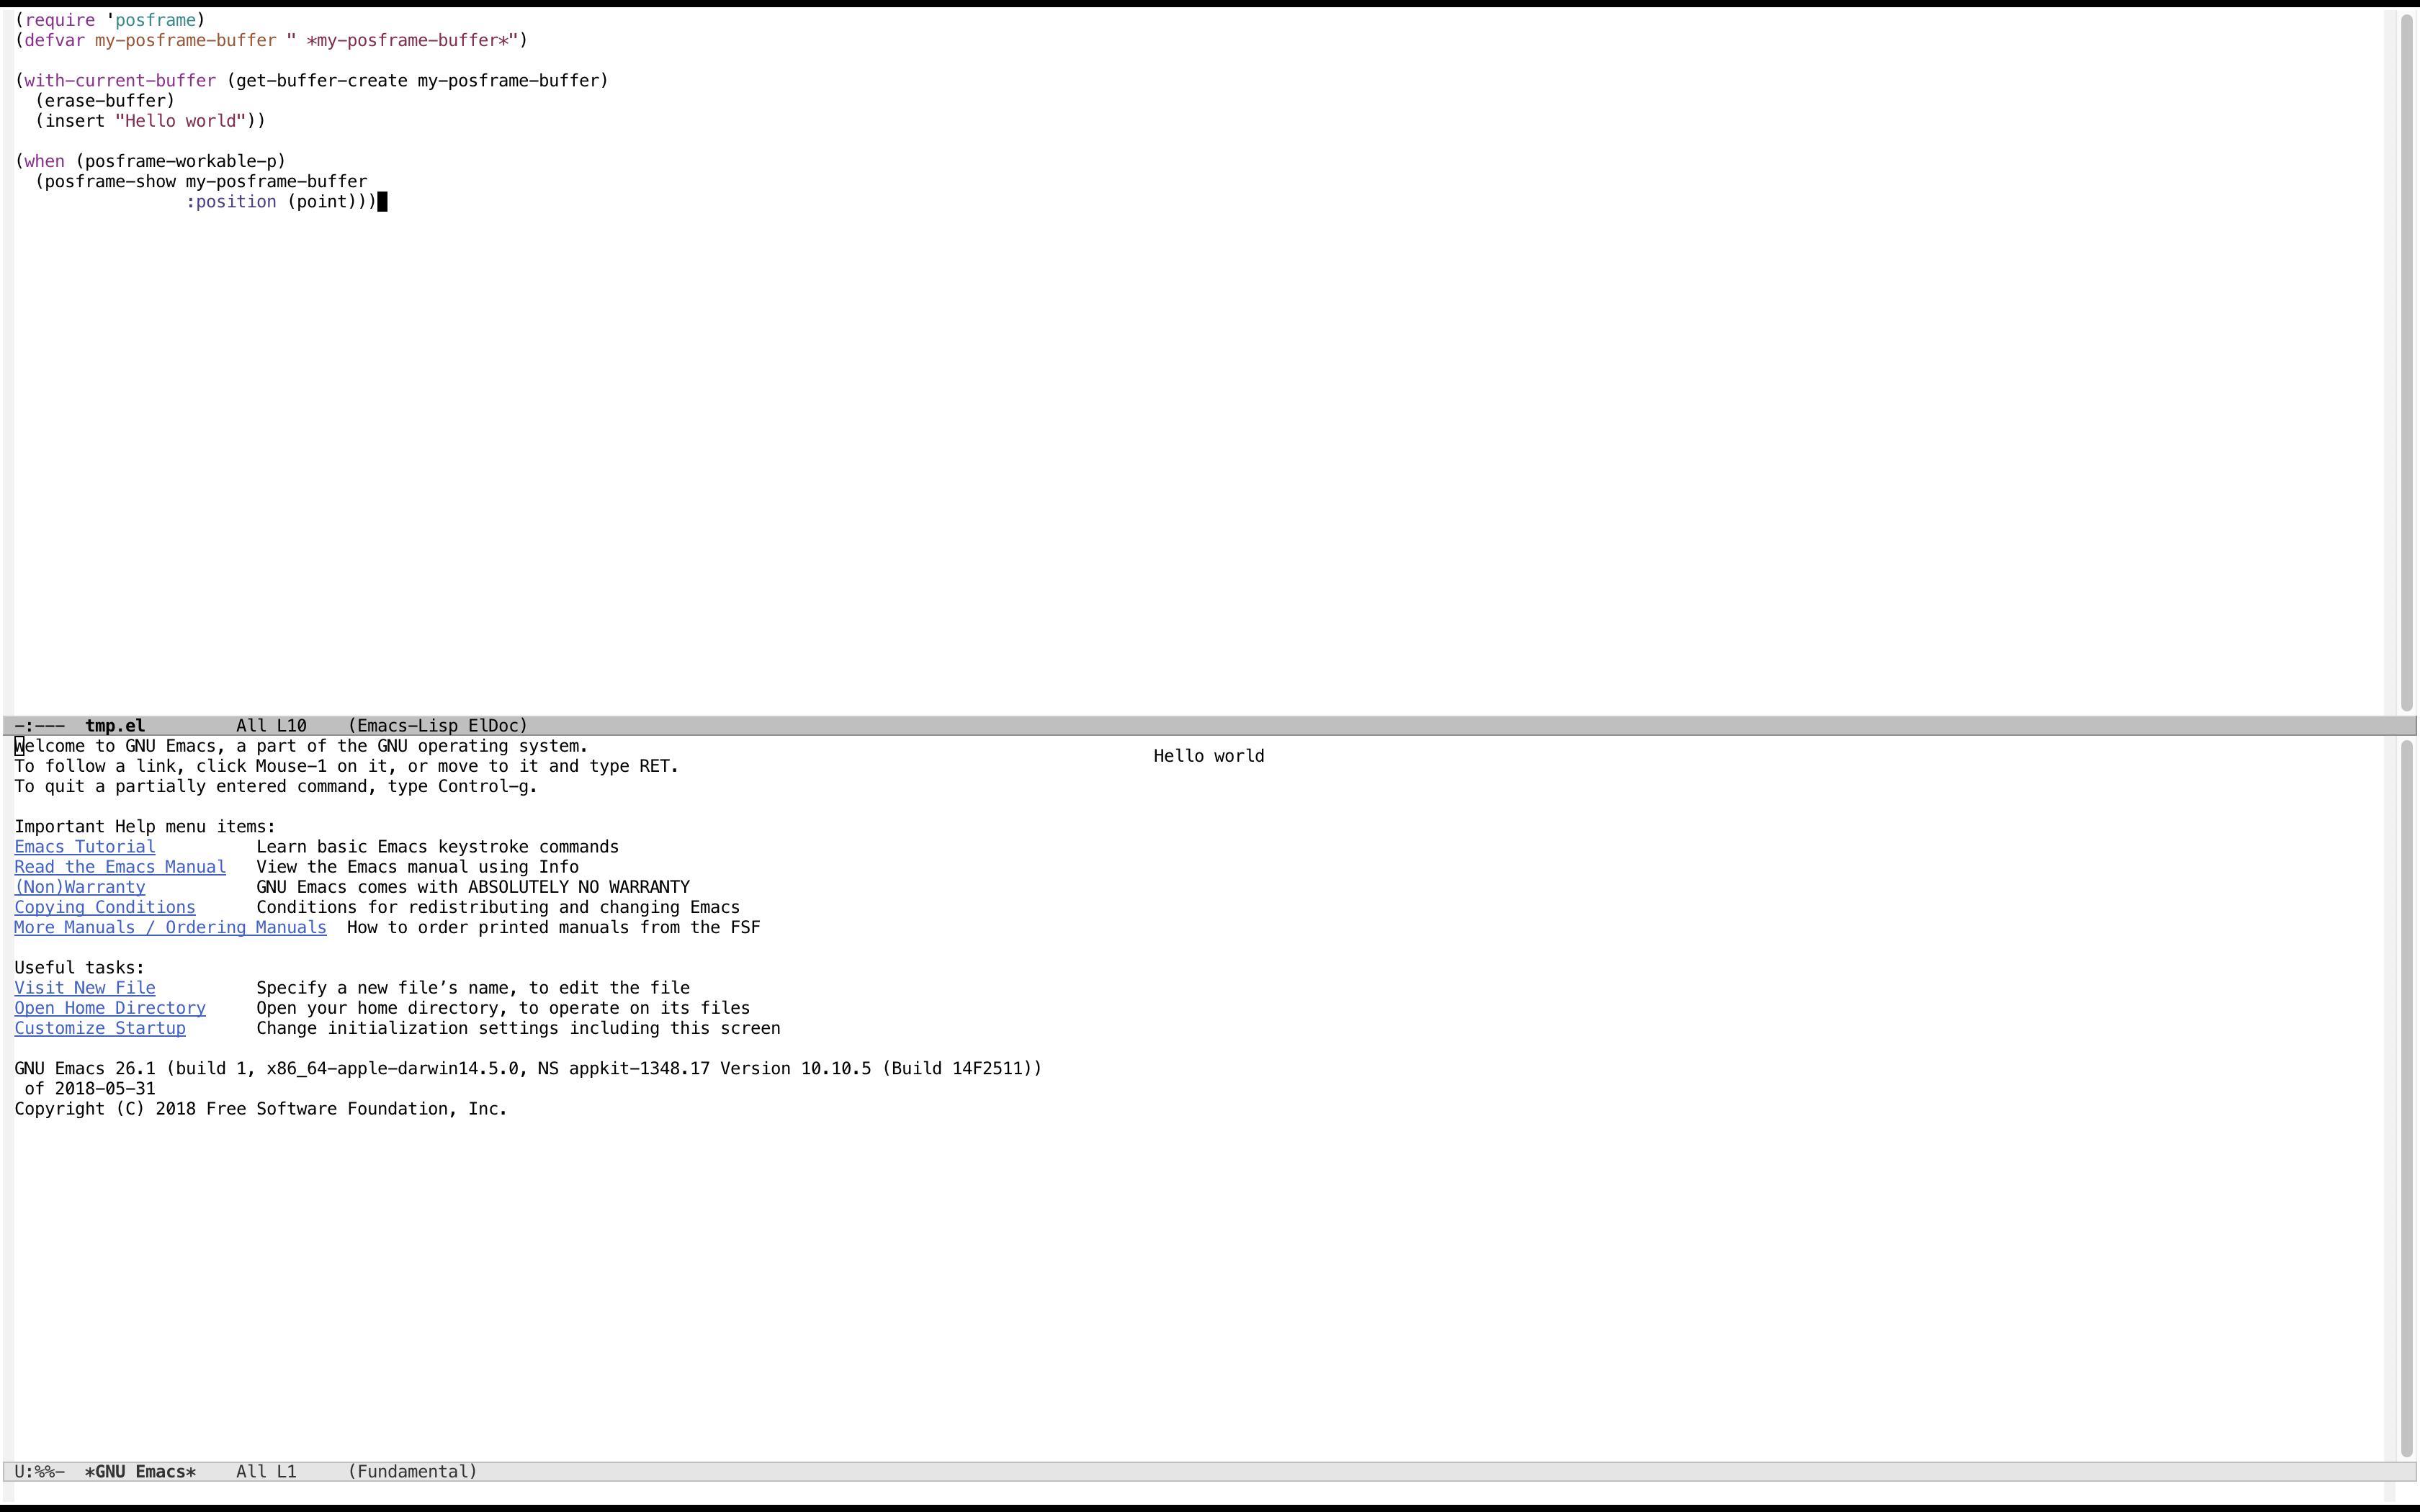 Posframe Mac OS black fullscreen · Issue #30 · tumashu/posframe · GitHub